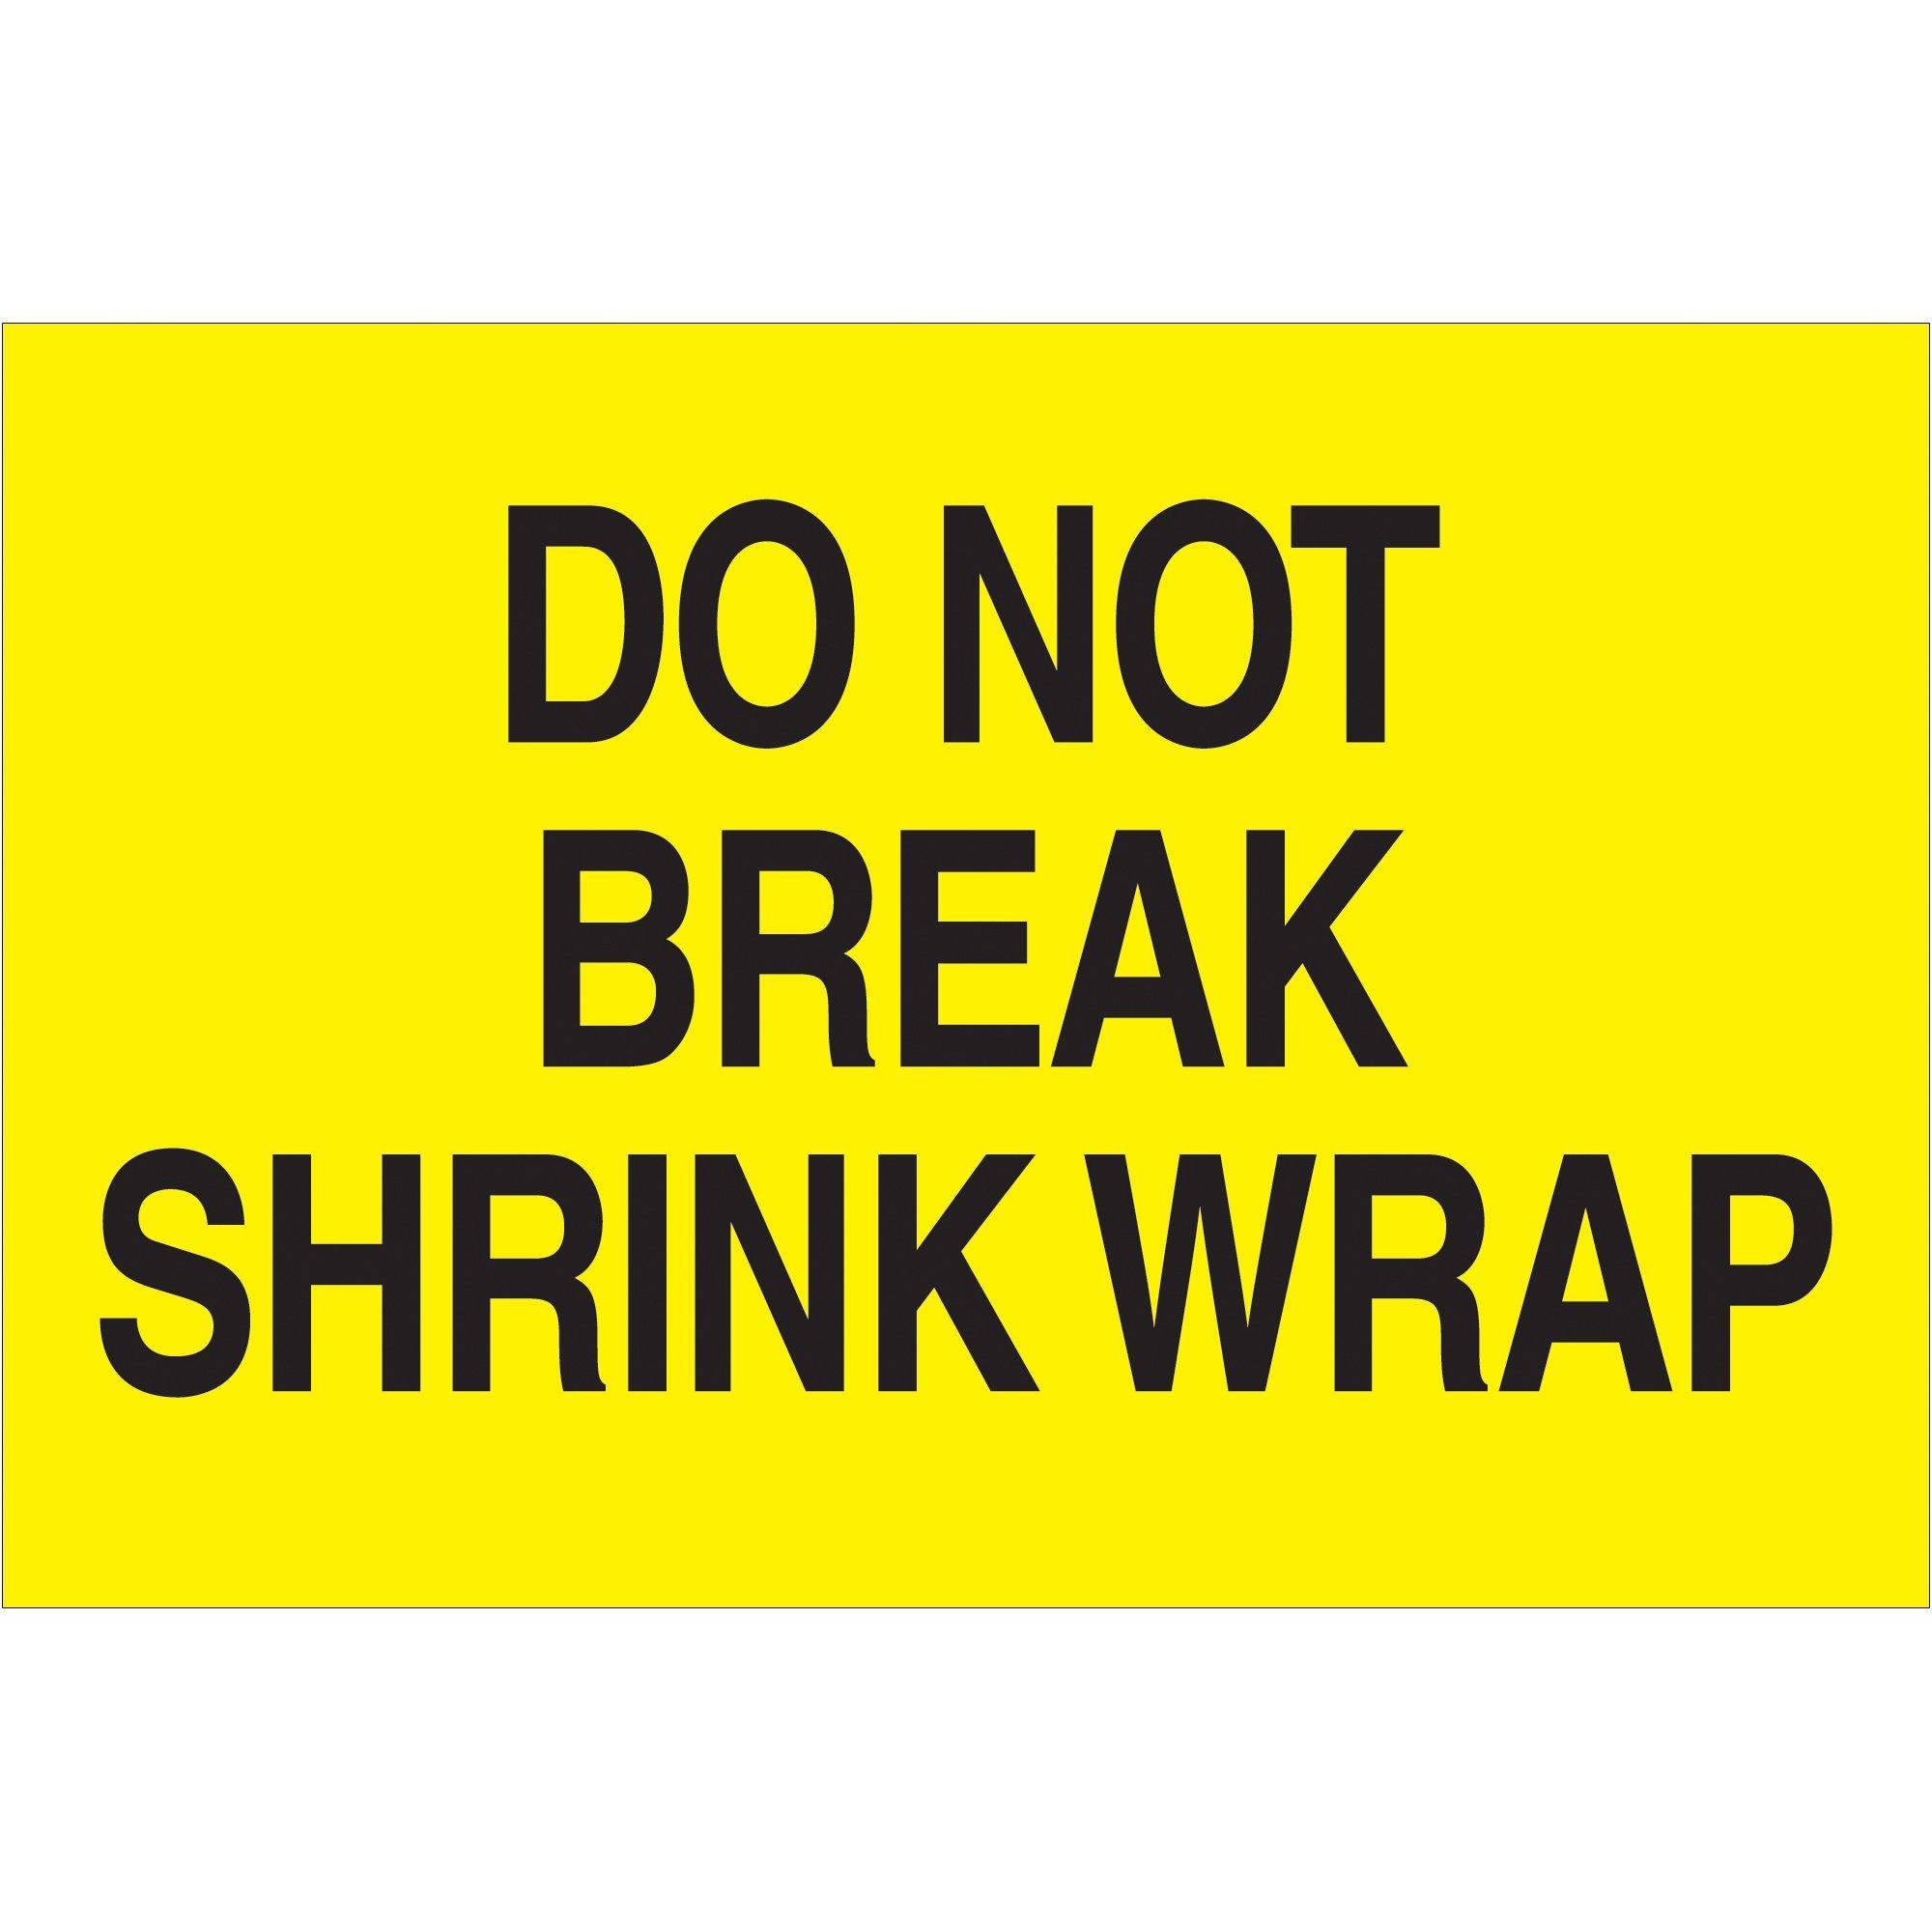 "Tape Logic DL1104 Special Handling Label, Legend""Do Not Break Shrink Wrap"", 3"" Length x 2"" Width, Fluorescent Yellow (Roll of 500)"